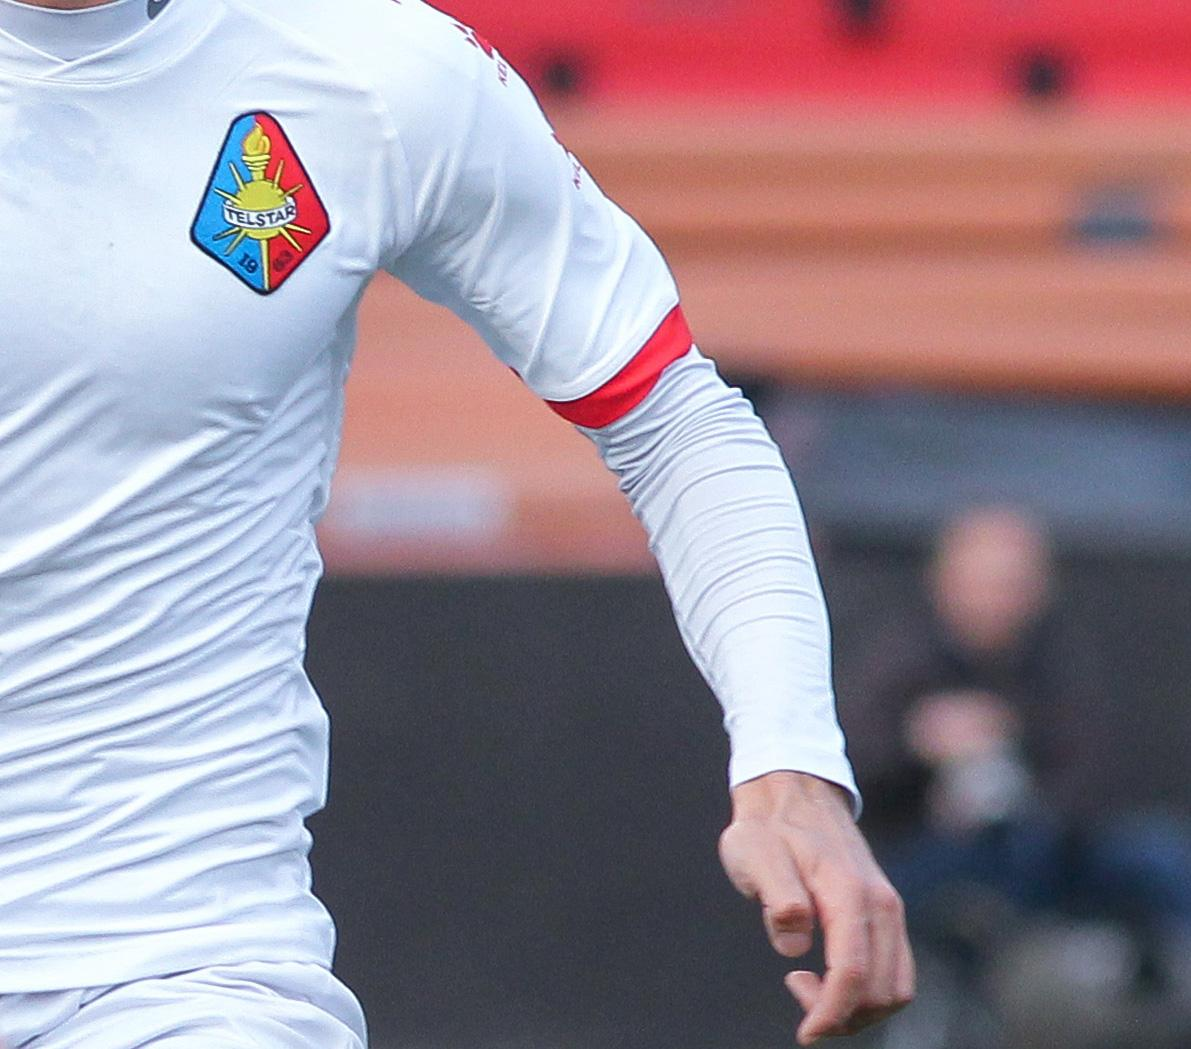 Telstar komt sterke start van Go Ahead Eagles niet te boven: 1-0 verlies in Almelo